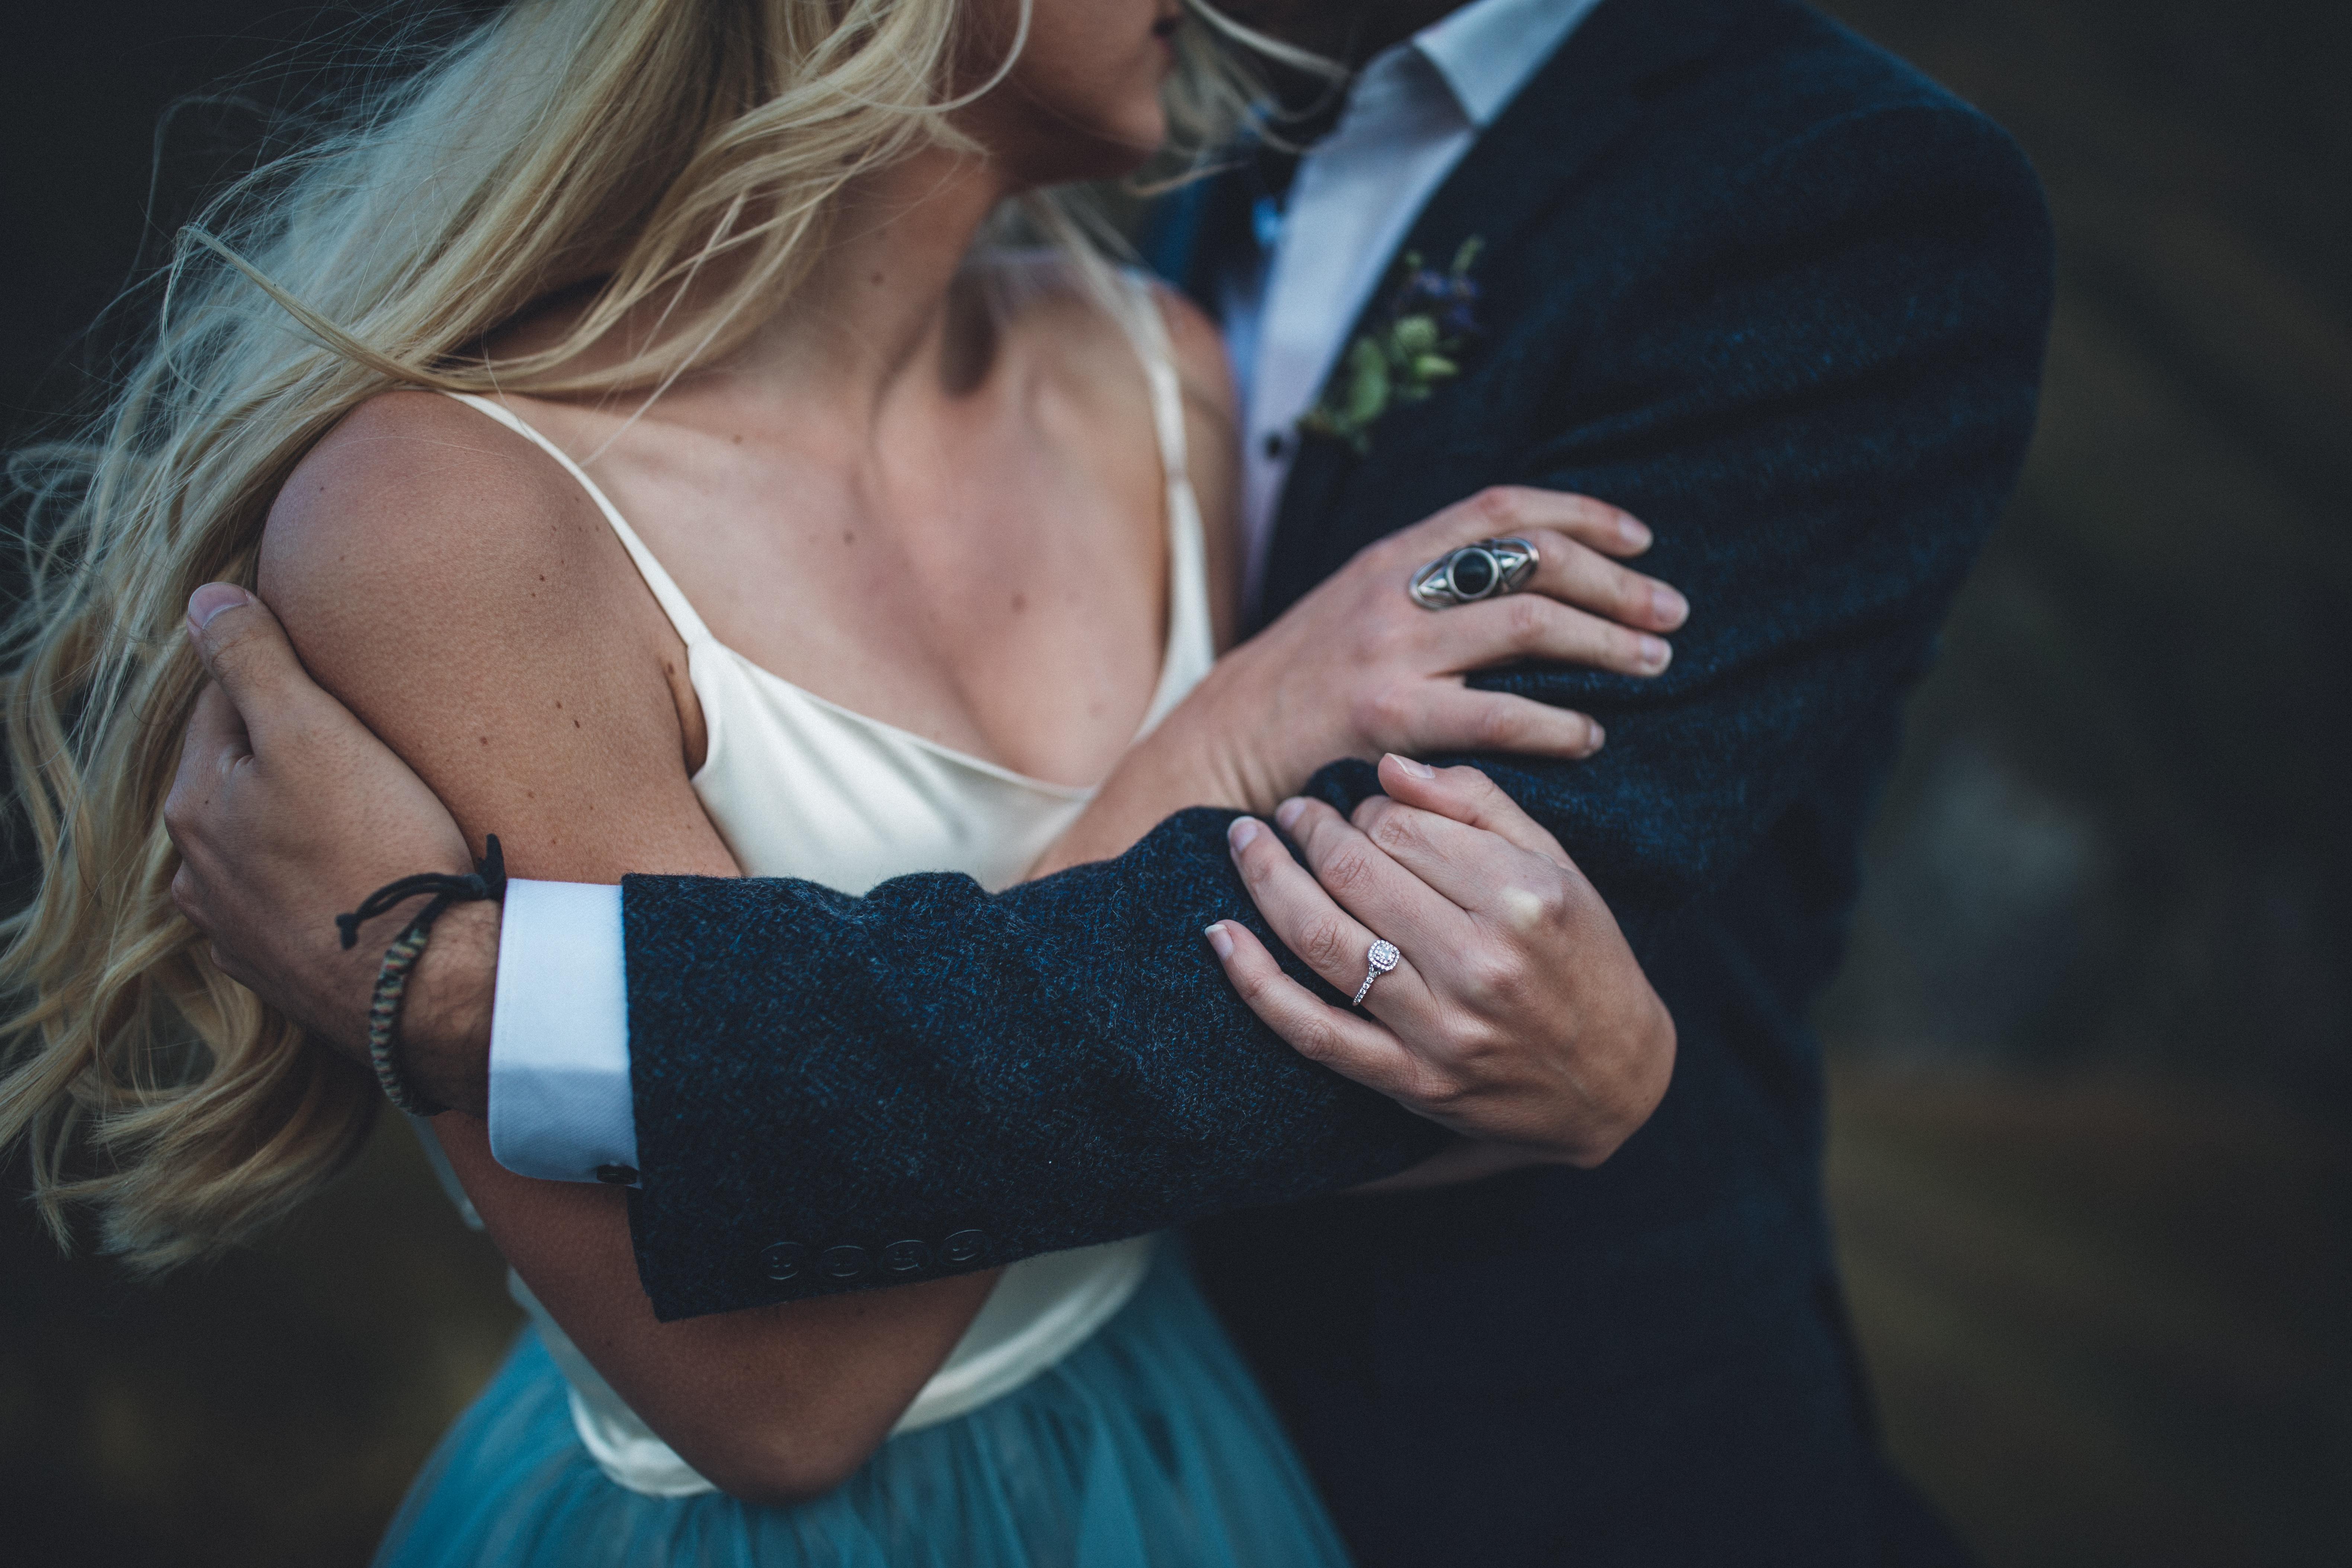 Categories: Weddings-Real Wedding: Carly + Elliot - Photography by Jim Pollard